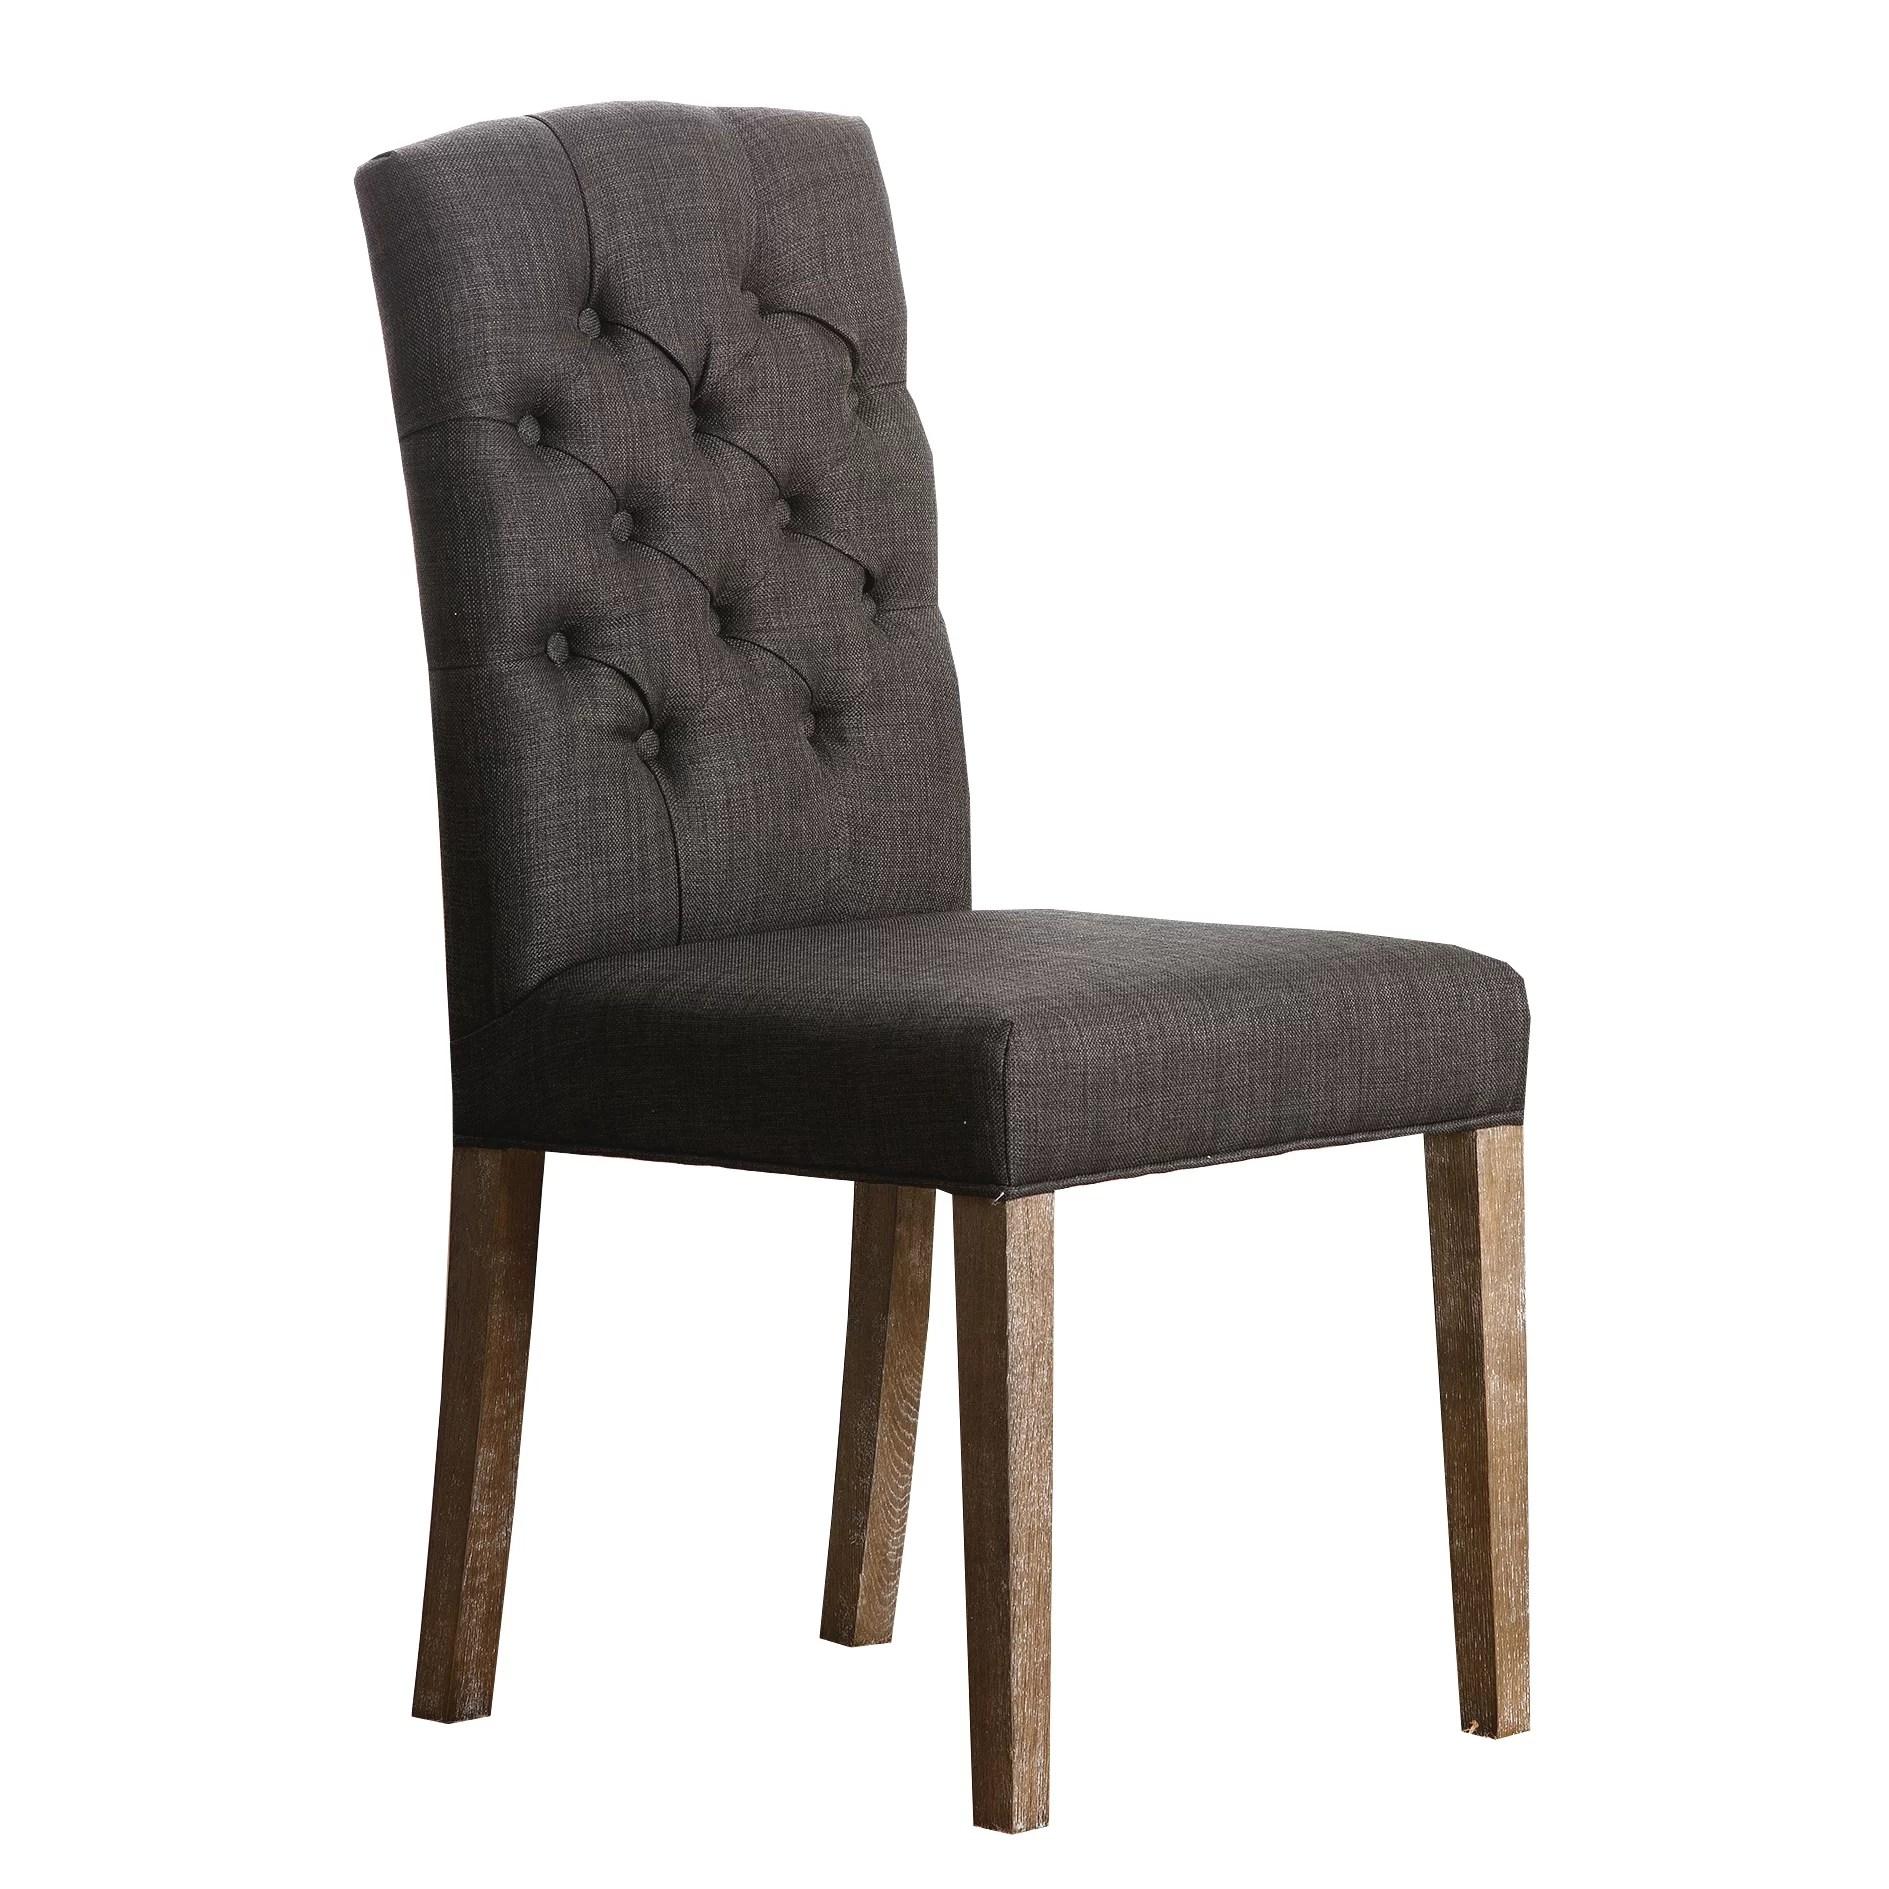 Abbyson Living Colin Parsons Chair  Reviews  Wayfair